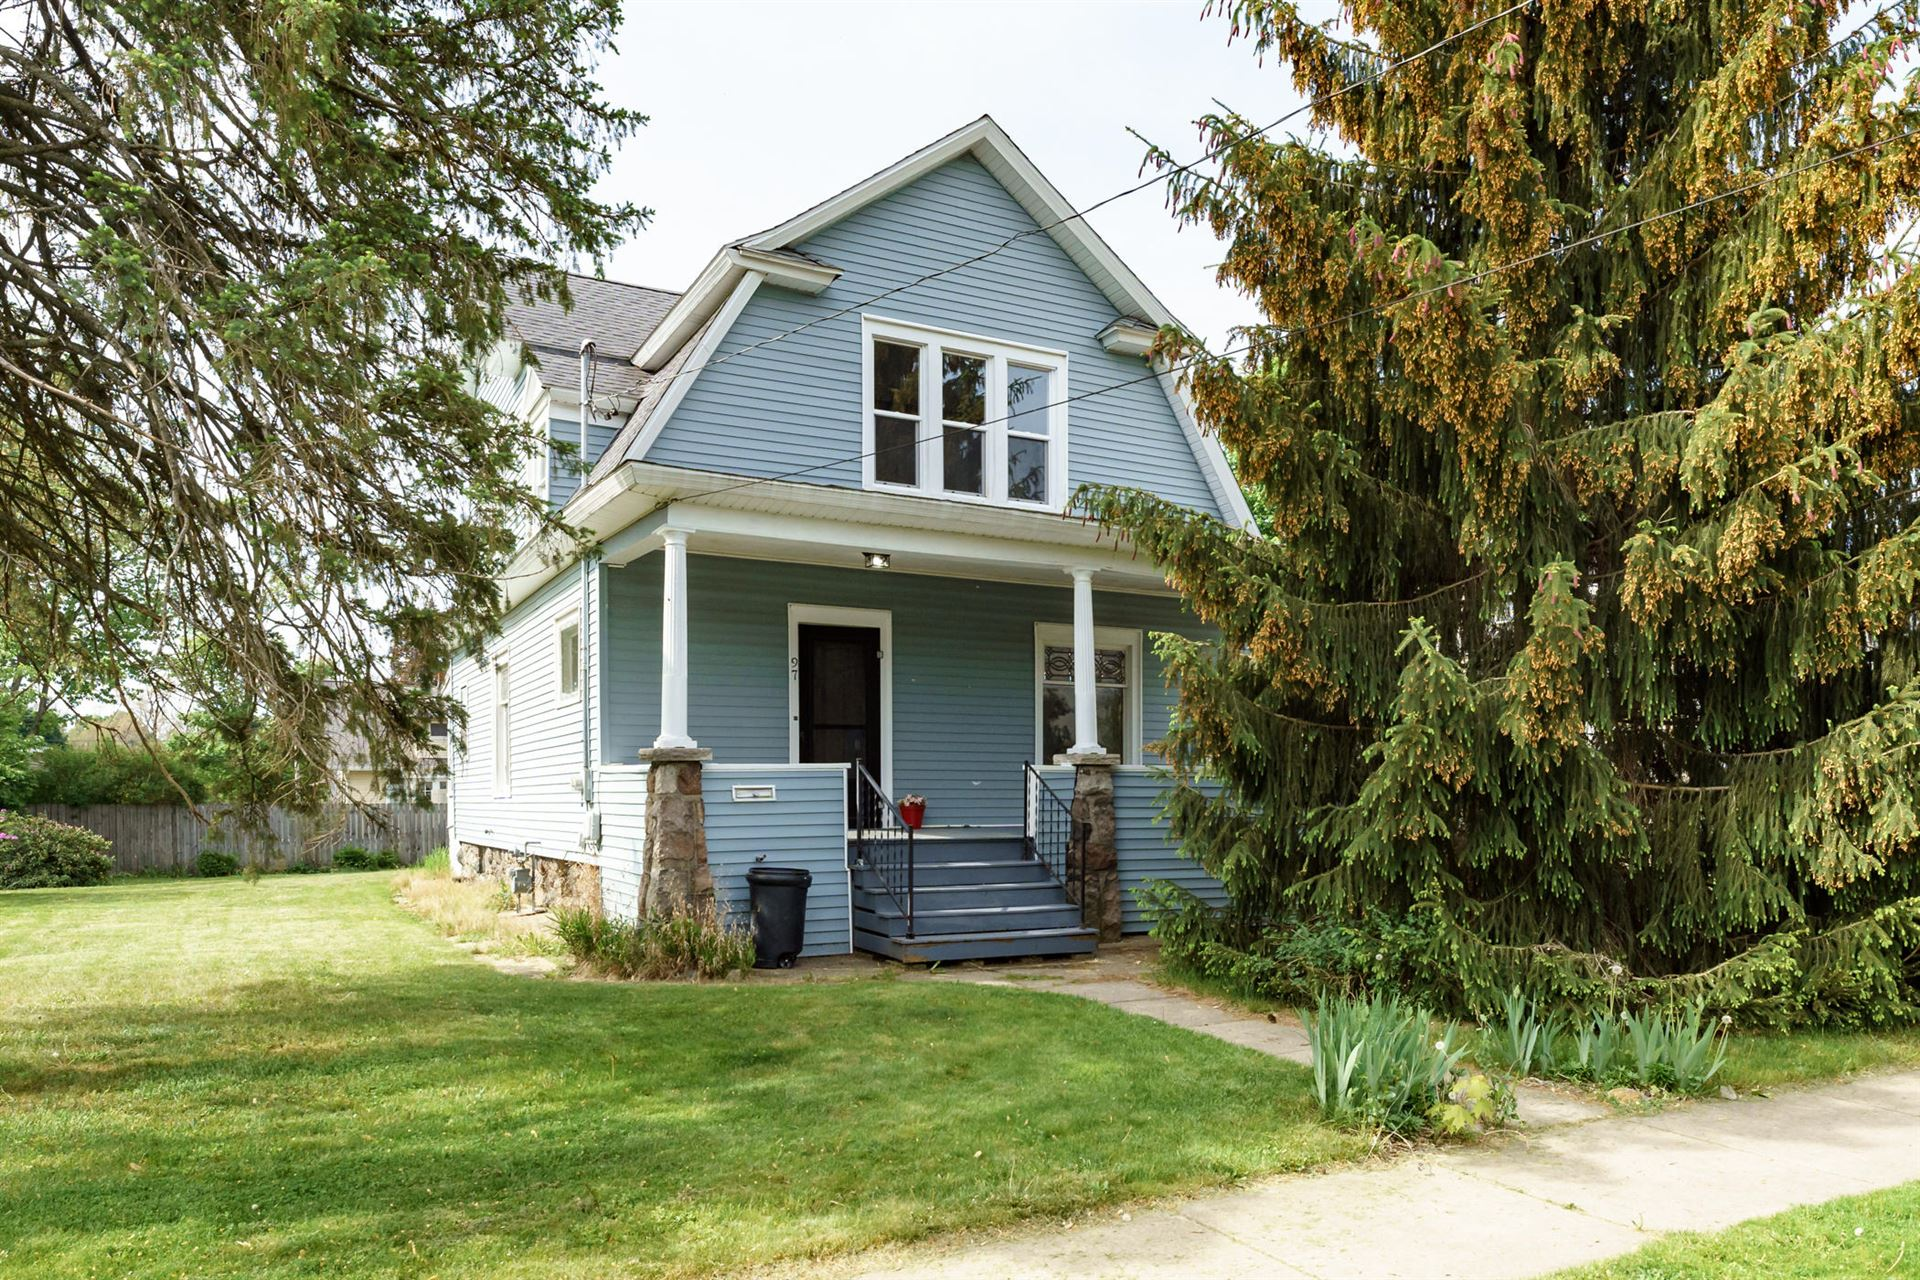 97 Summer Street, Battle Creek, MI 49015 - MLS#: 21018612